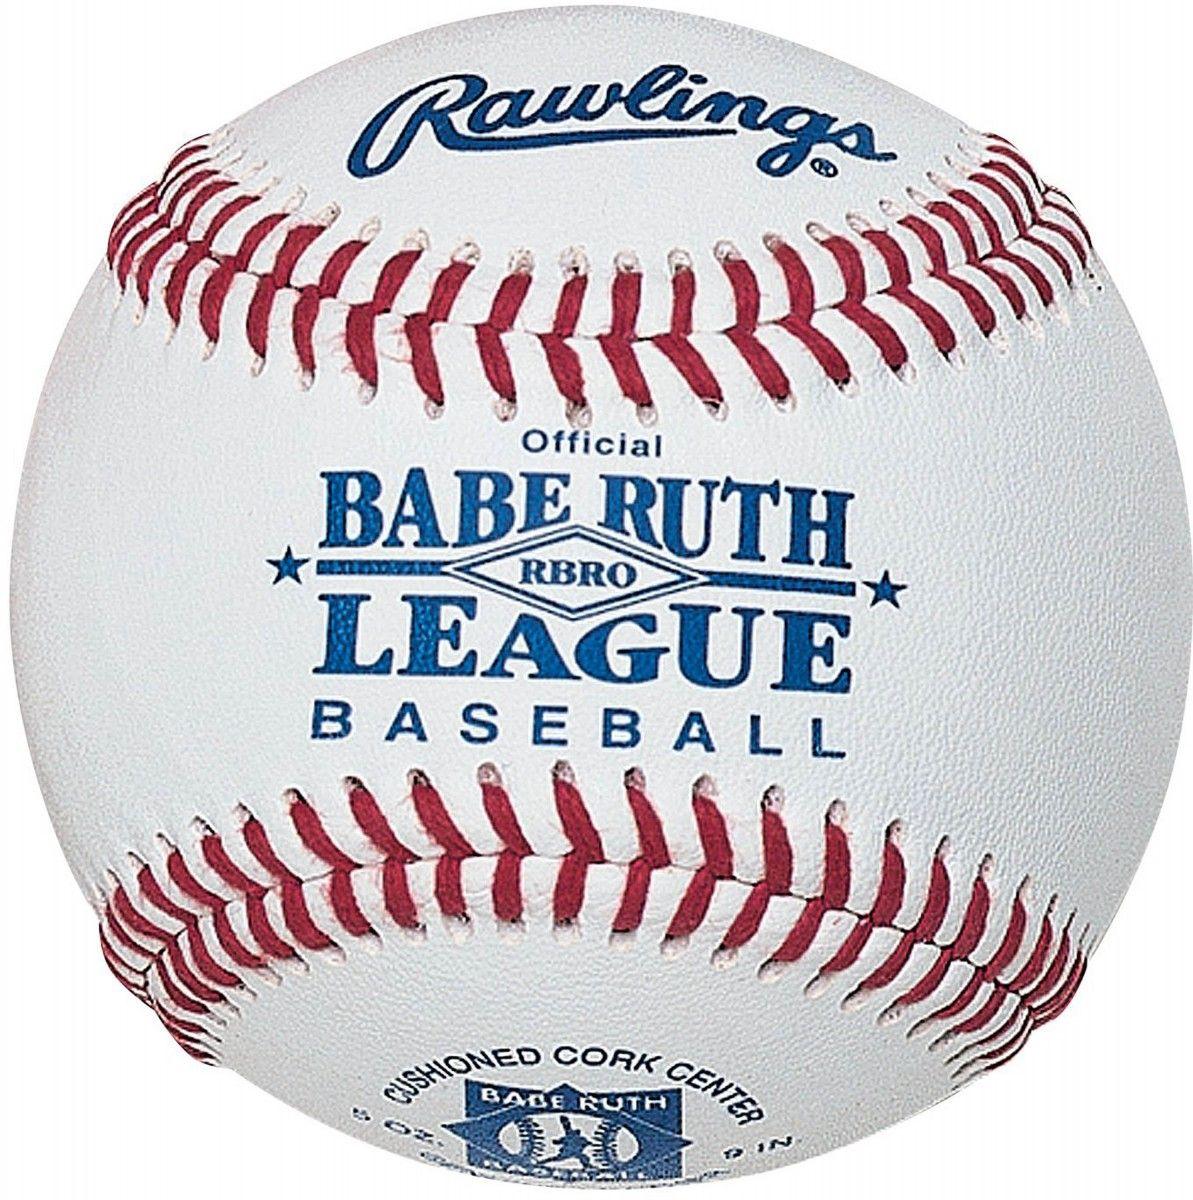 12 Pieces Full-grain Leather Cover Competition Grade Leather Dozen Baseballs